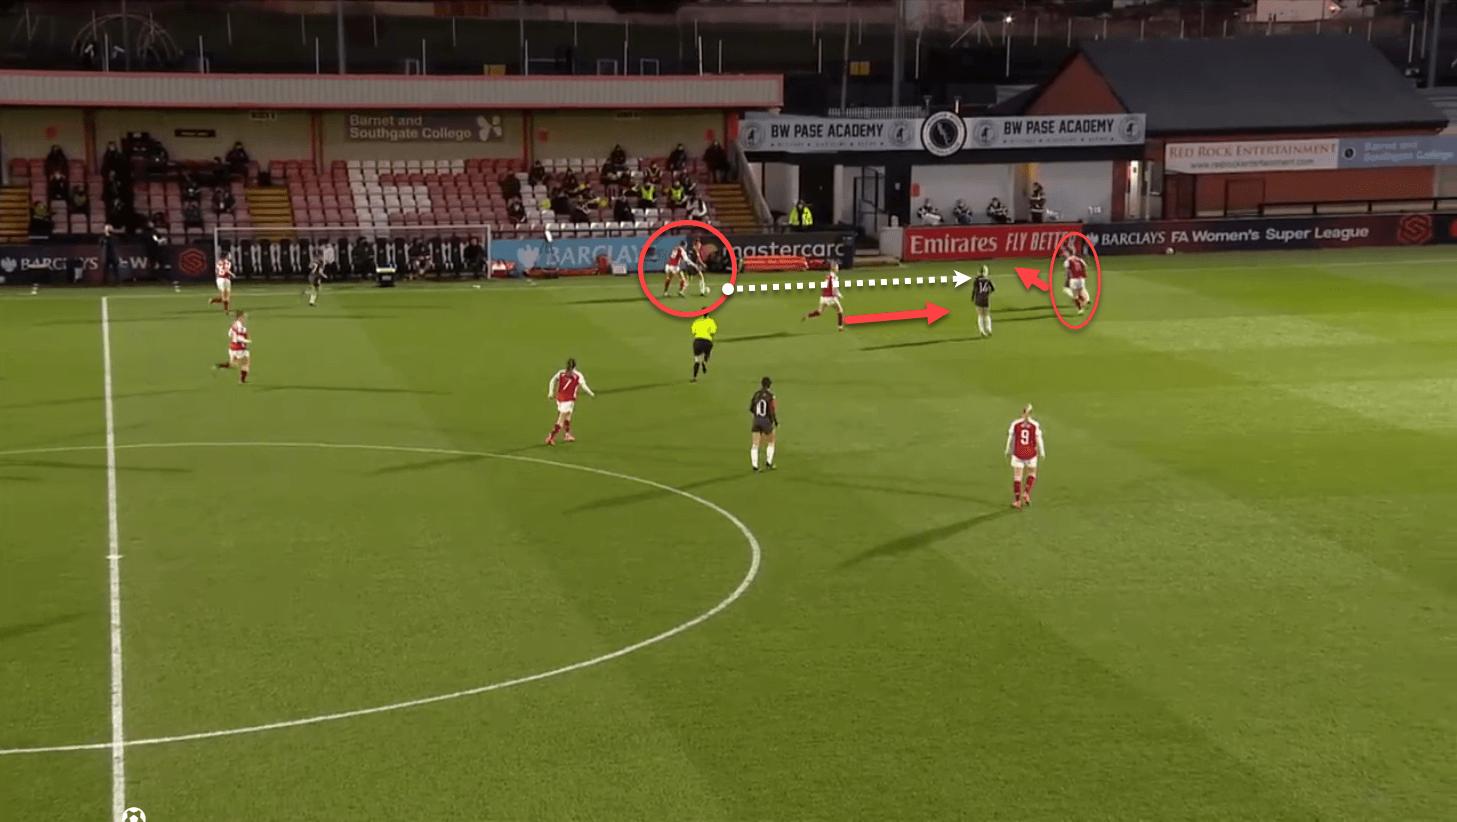 FAWSL 2020/21: Arsenal vs Manchester United Women tactical analysis tactics